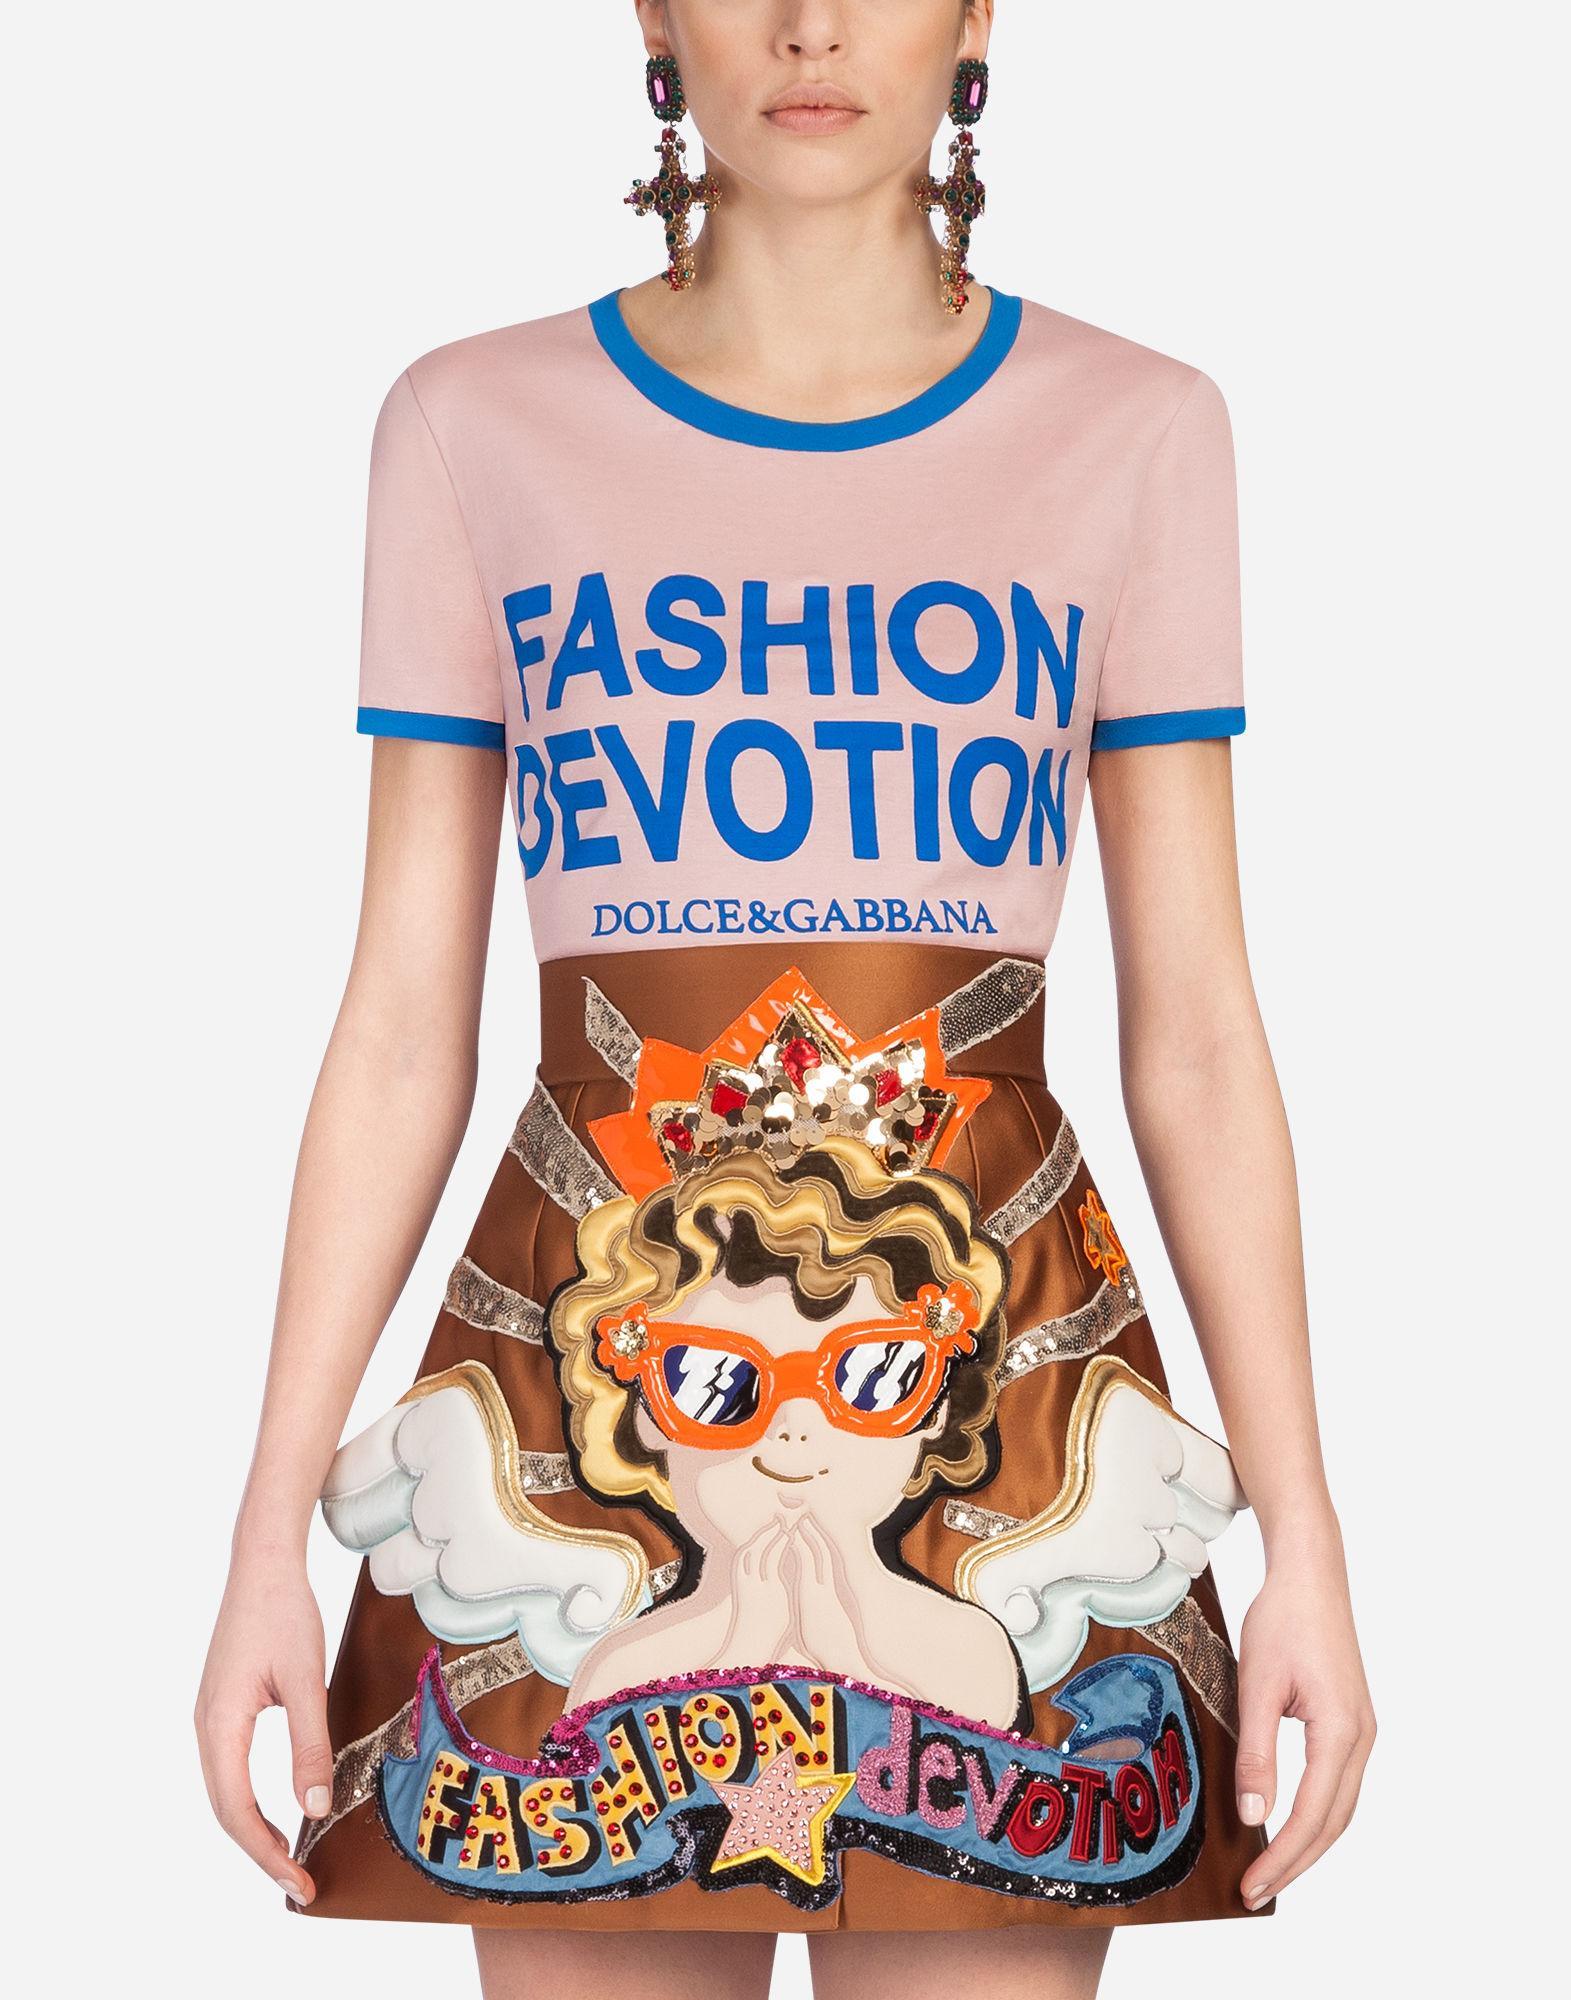 Dolce & Gabbana Fashion Devotion Printed Jersey T-shirt In Pink